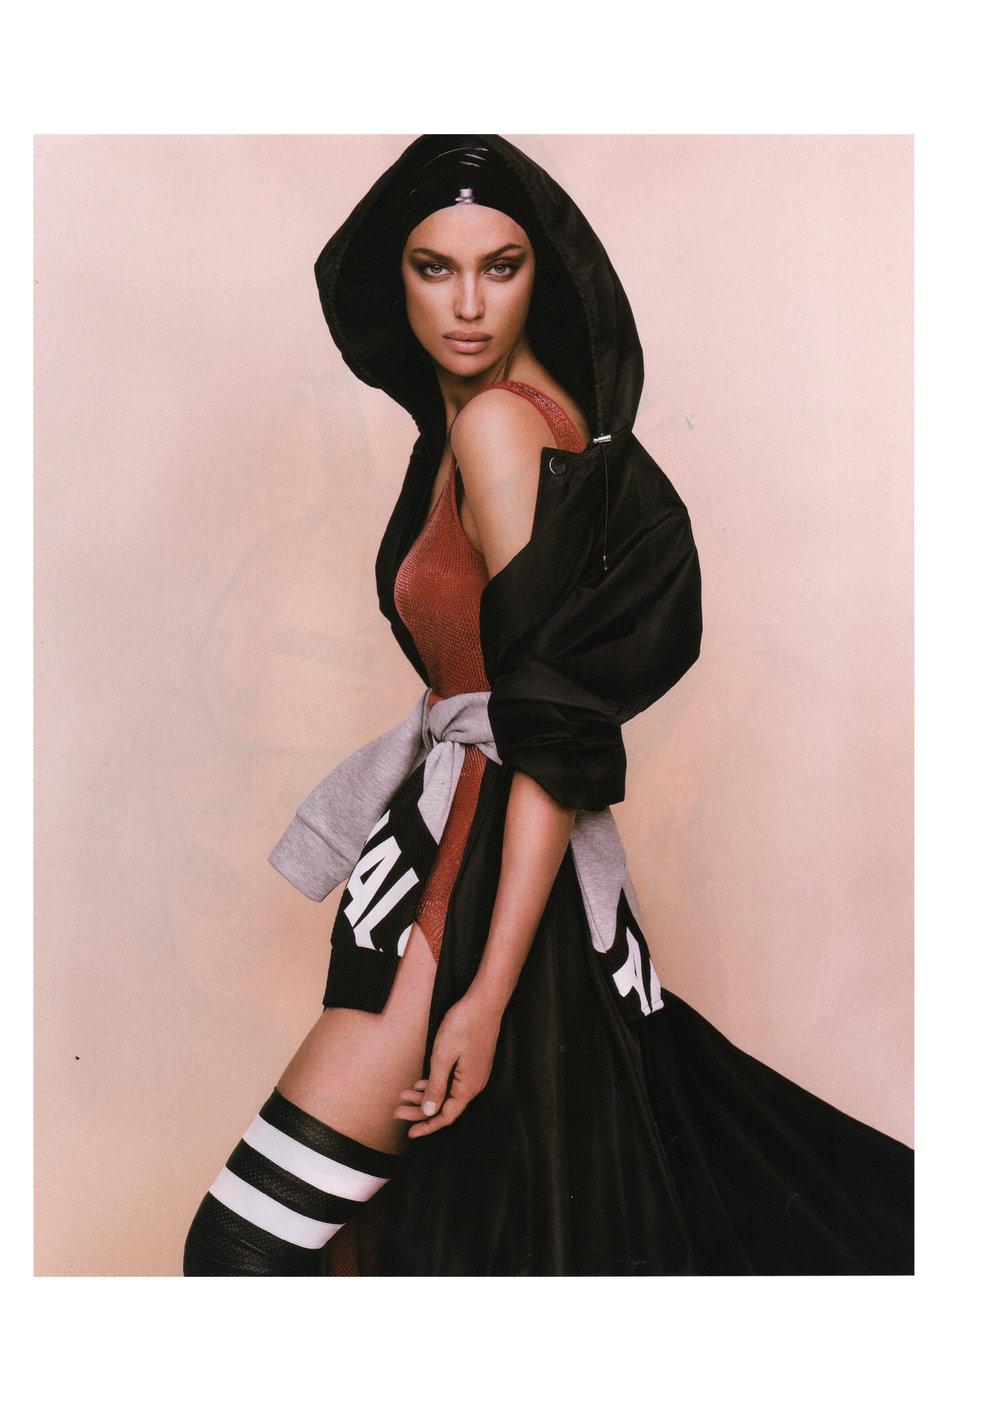 Copy of Irina Shayk